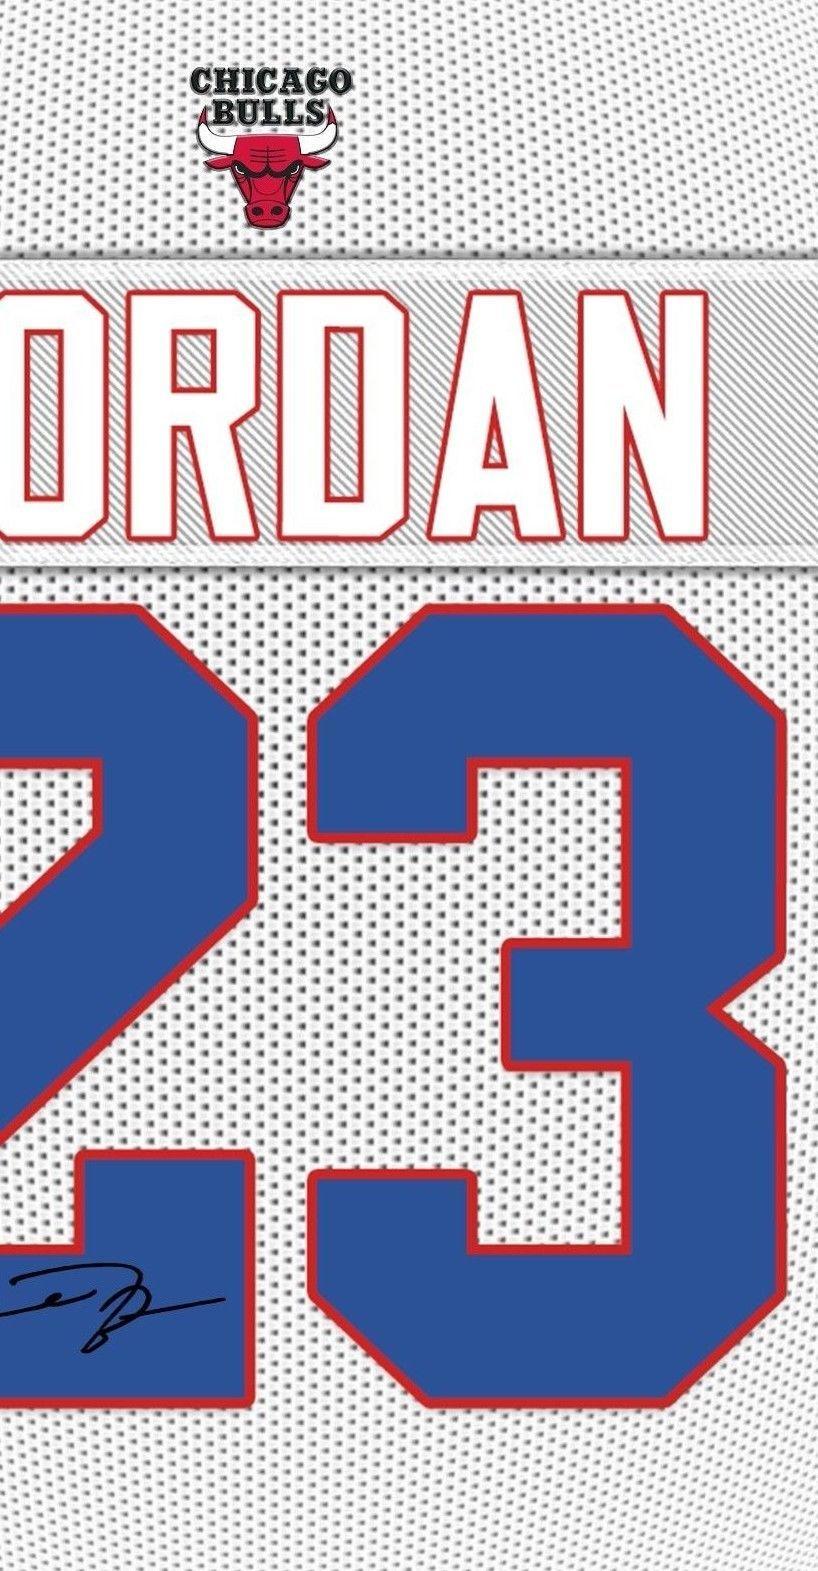 Michael Jordan Chicago Bulls signed autograph Framed 100% COTTON Canvas print